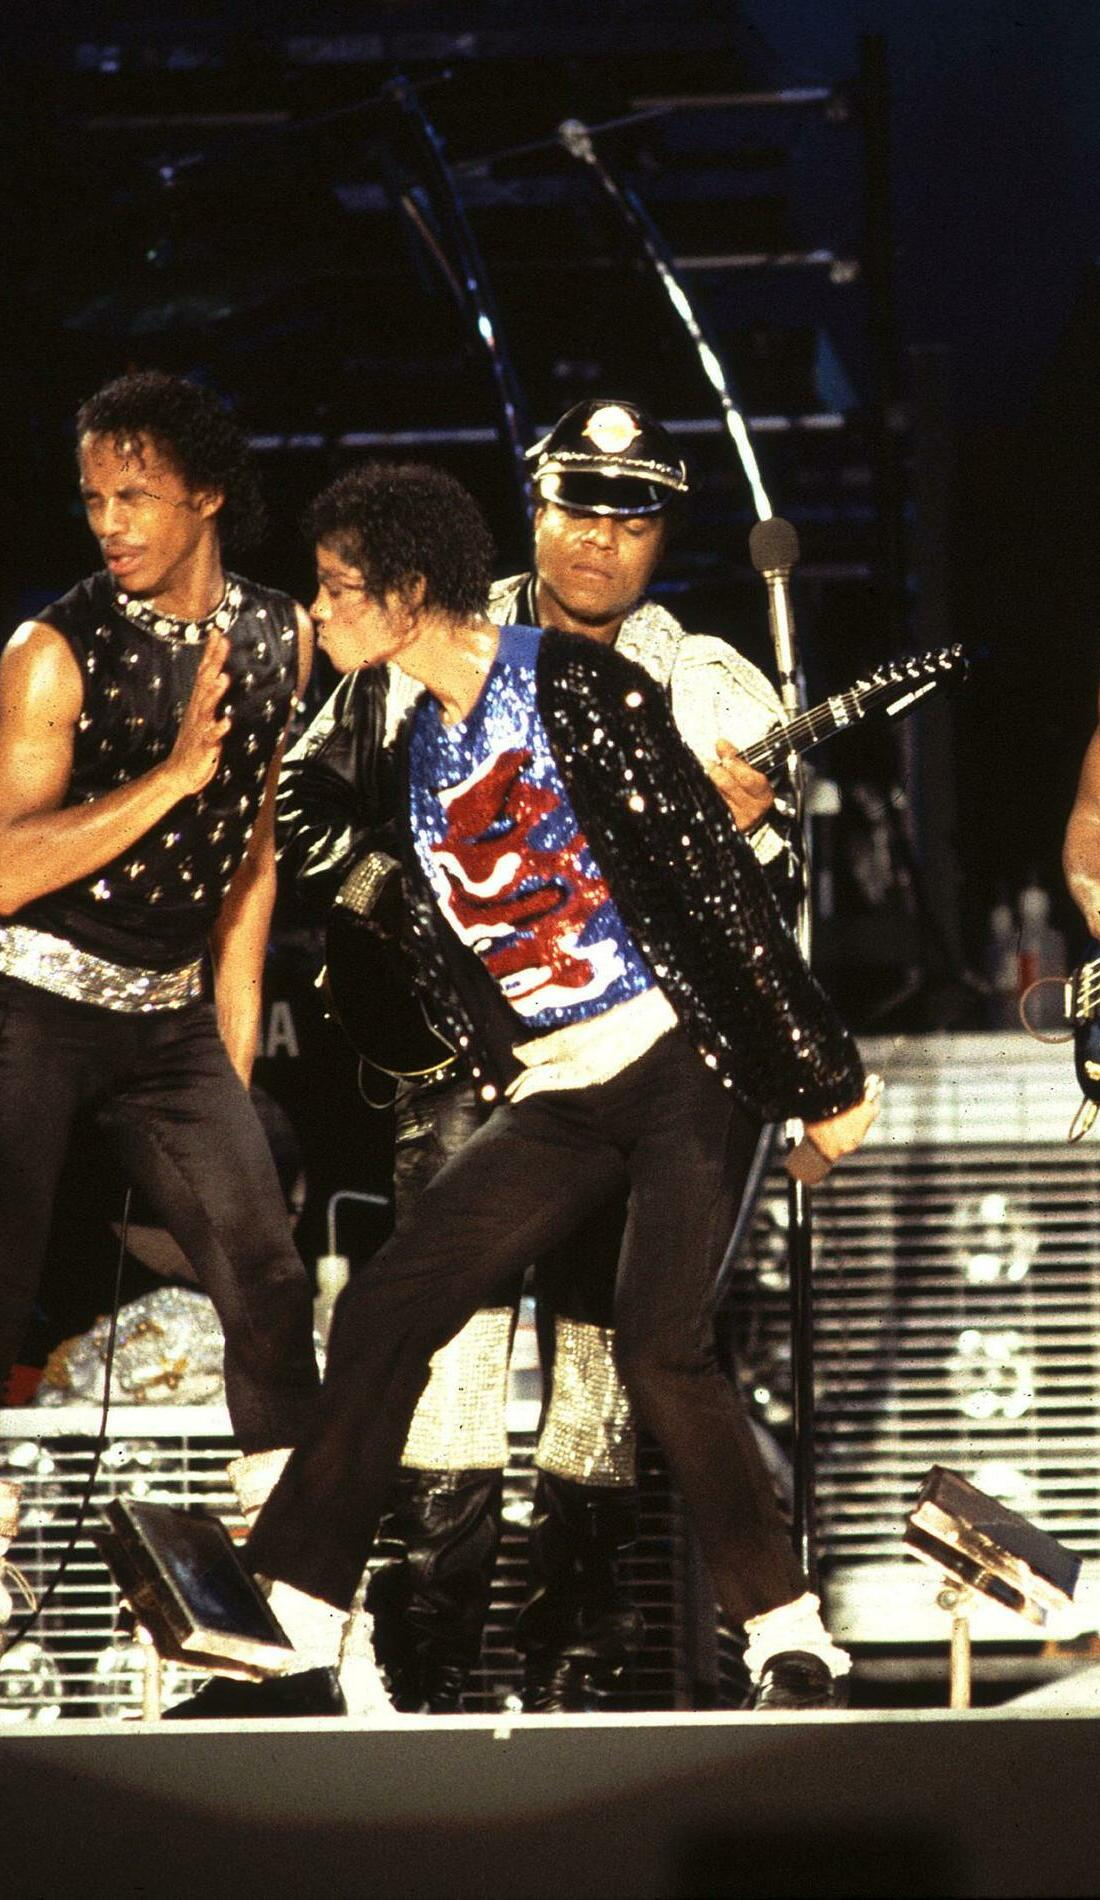 A The Jacksons live event